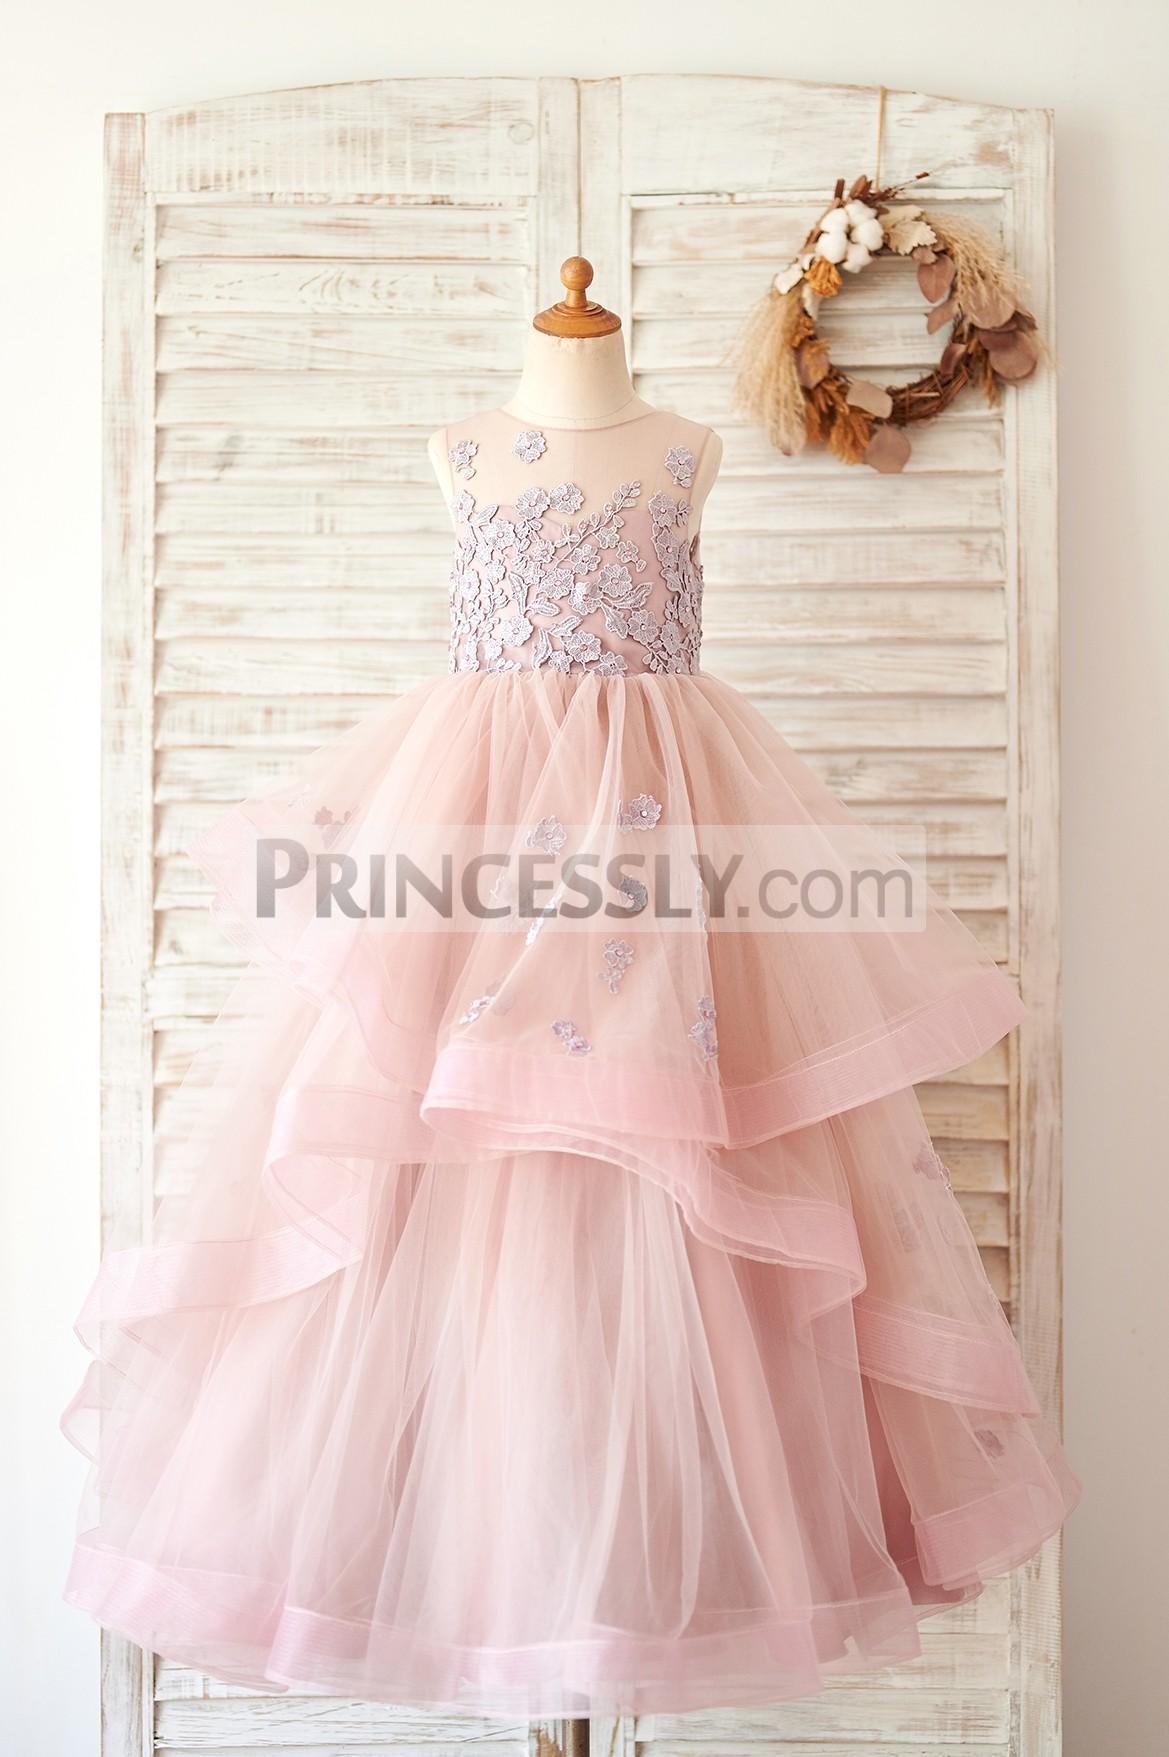 Princessly.com-K1004062-Mauve Lace Tulle Floor Length Wedding Flower Girl Dress-31